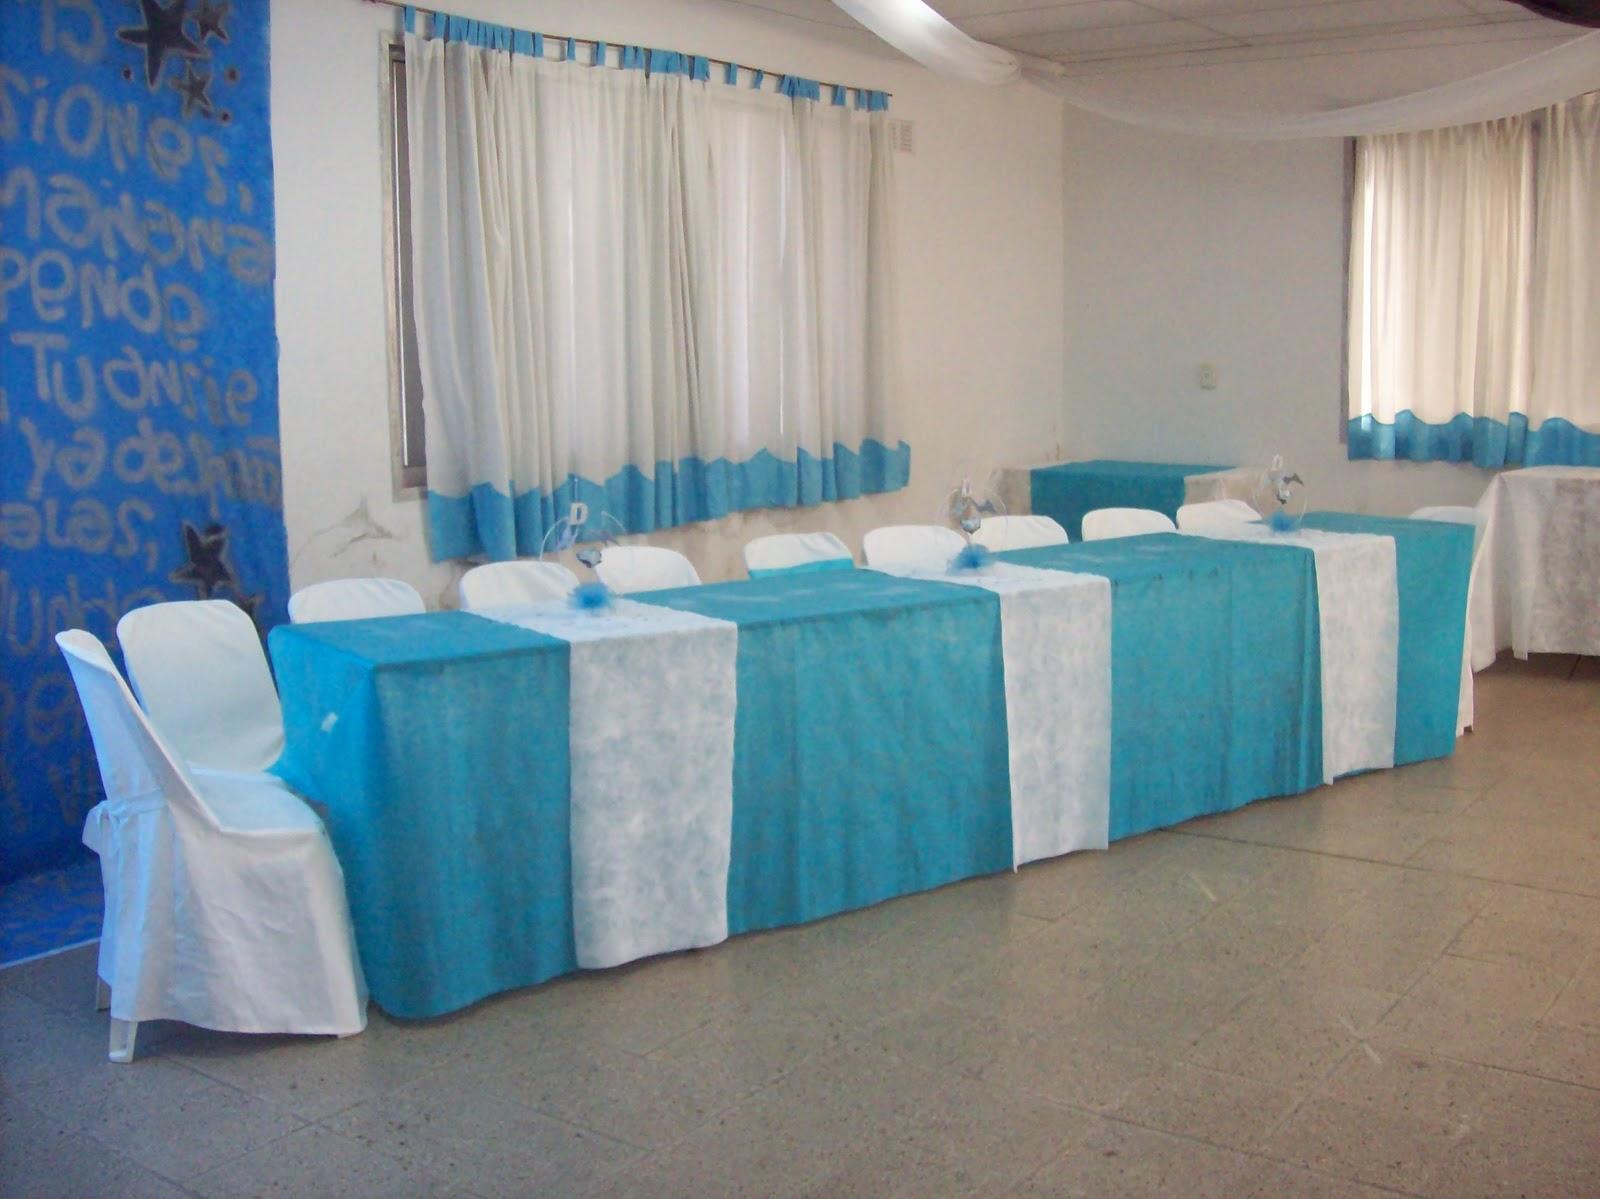 Concept studio decoraci n sal n 15 a os for Decoracion de salon con telas y luces